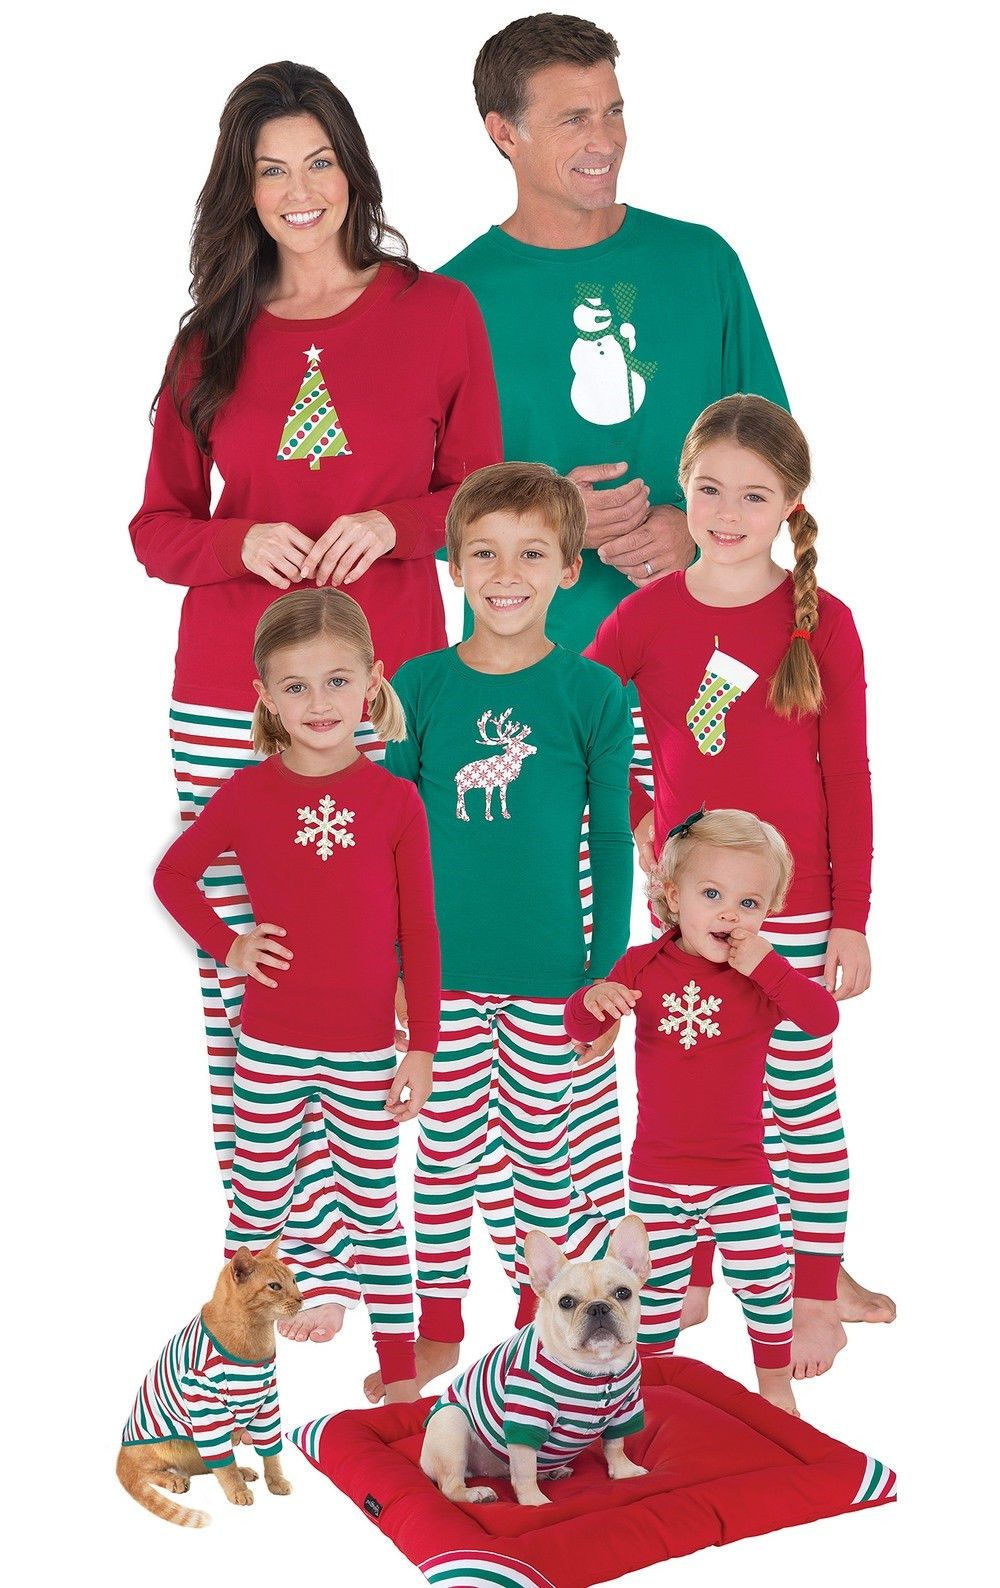 ca8215df48  7.99 - Family Christmas Pajamas Set Women Men Baby Kids Deer Sleepwear  Nightwear  ebay  Fashion